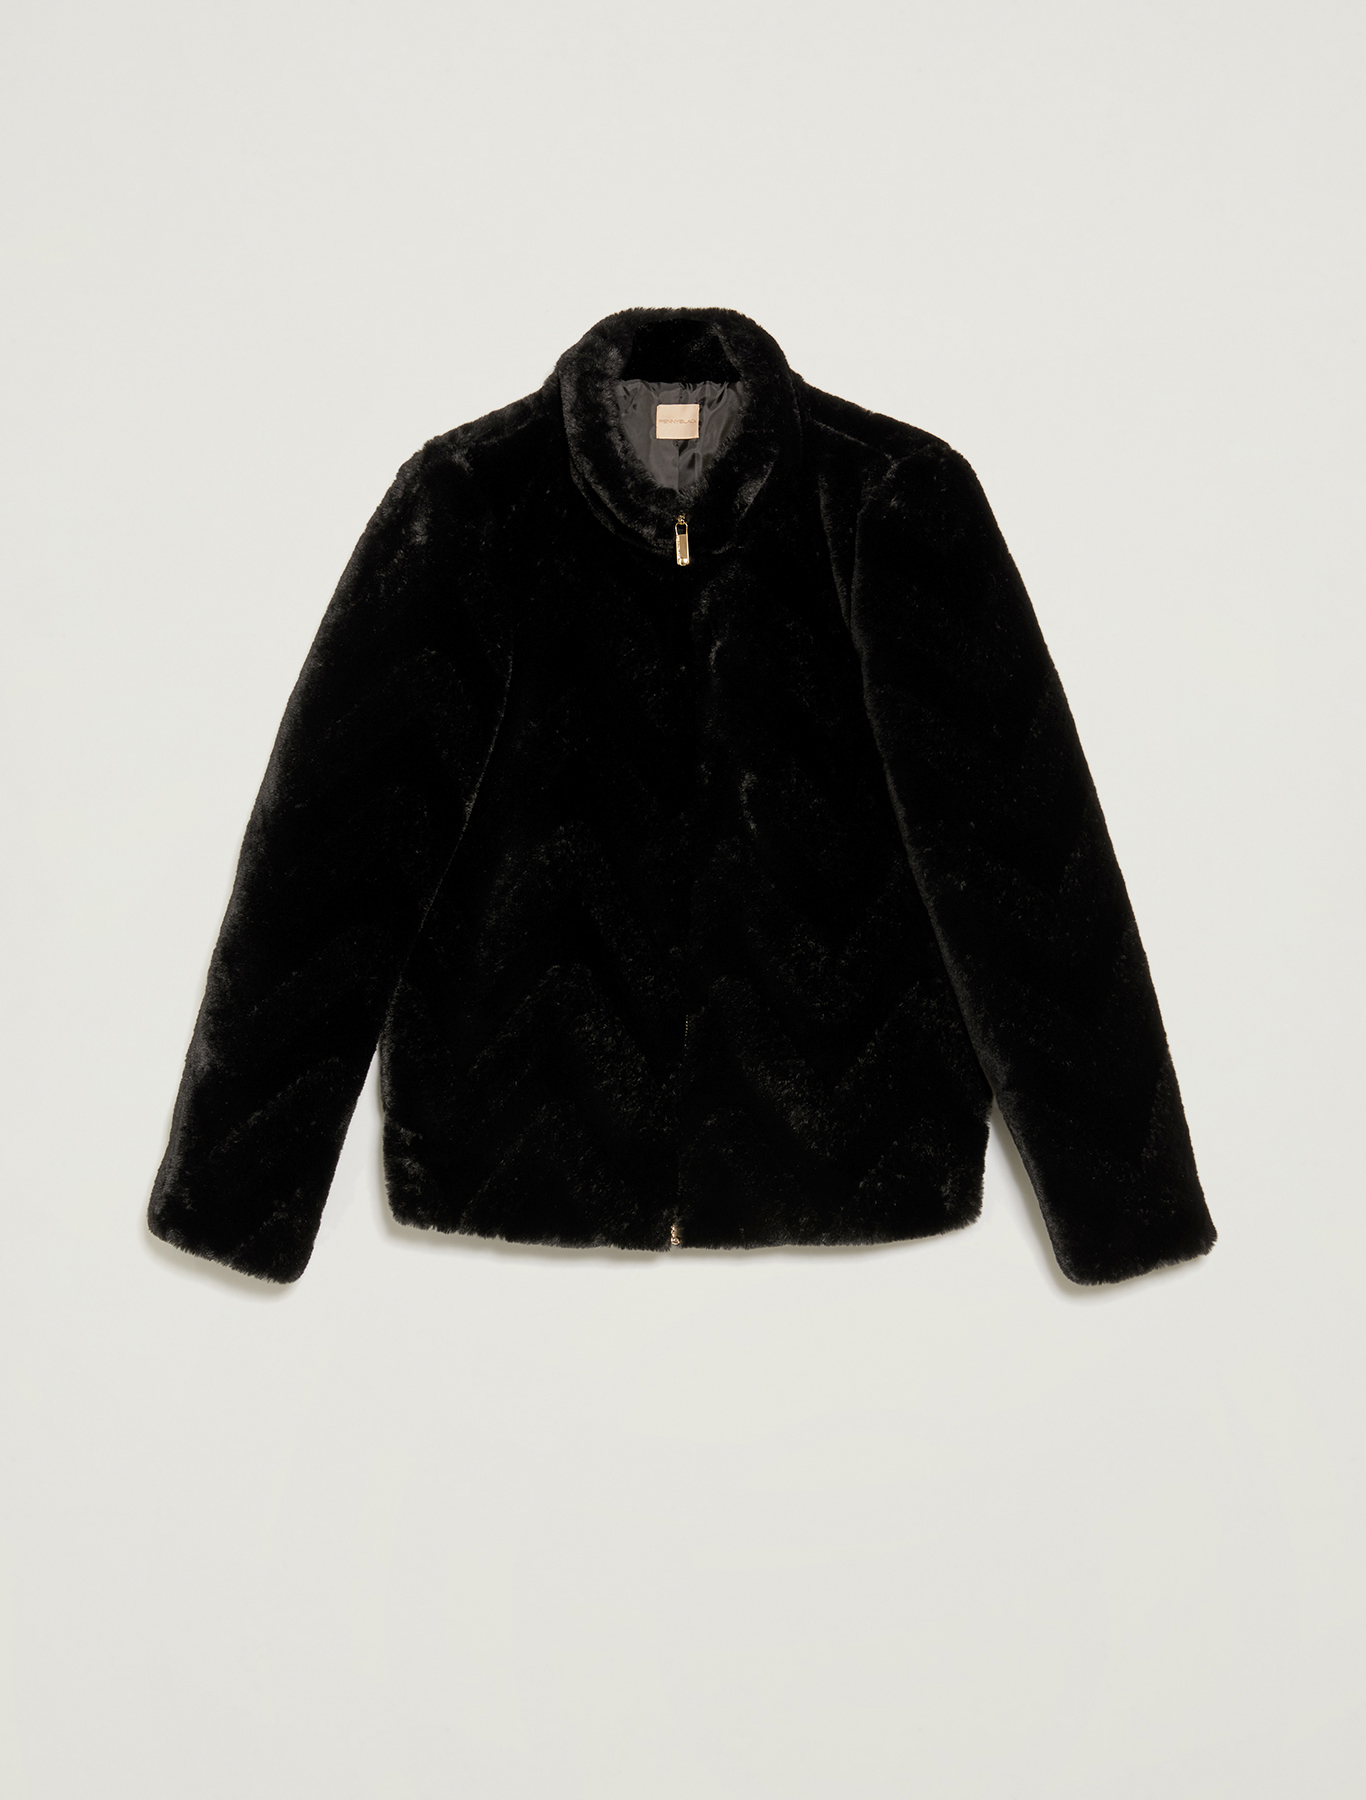 Zipped plush jacket - black - pennyblack